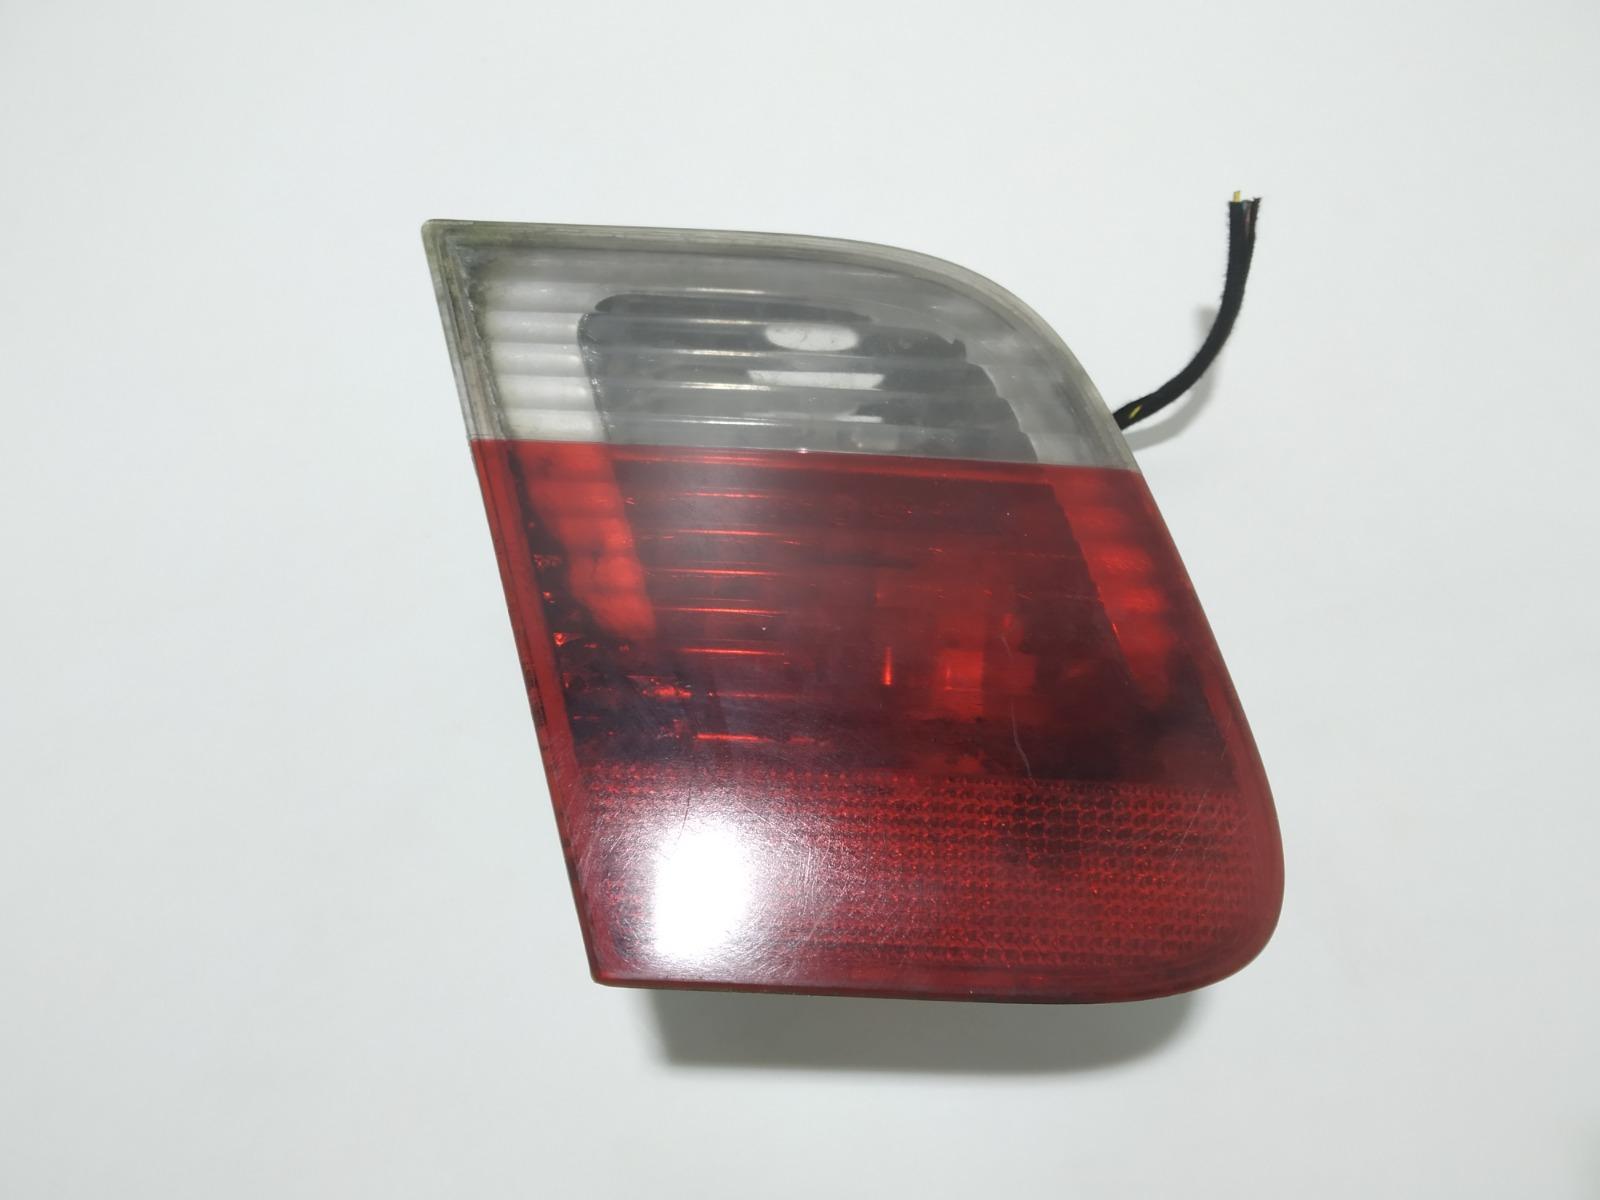 Фонарь крышки багажника левый Bmw 3 E46 2.5 I 2002 (б/у)